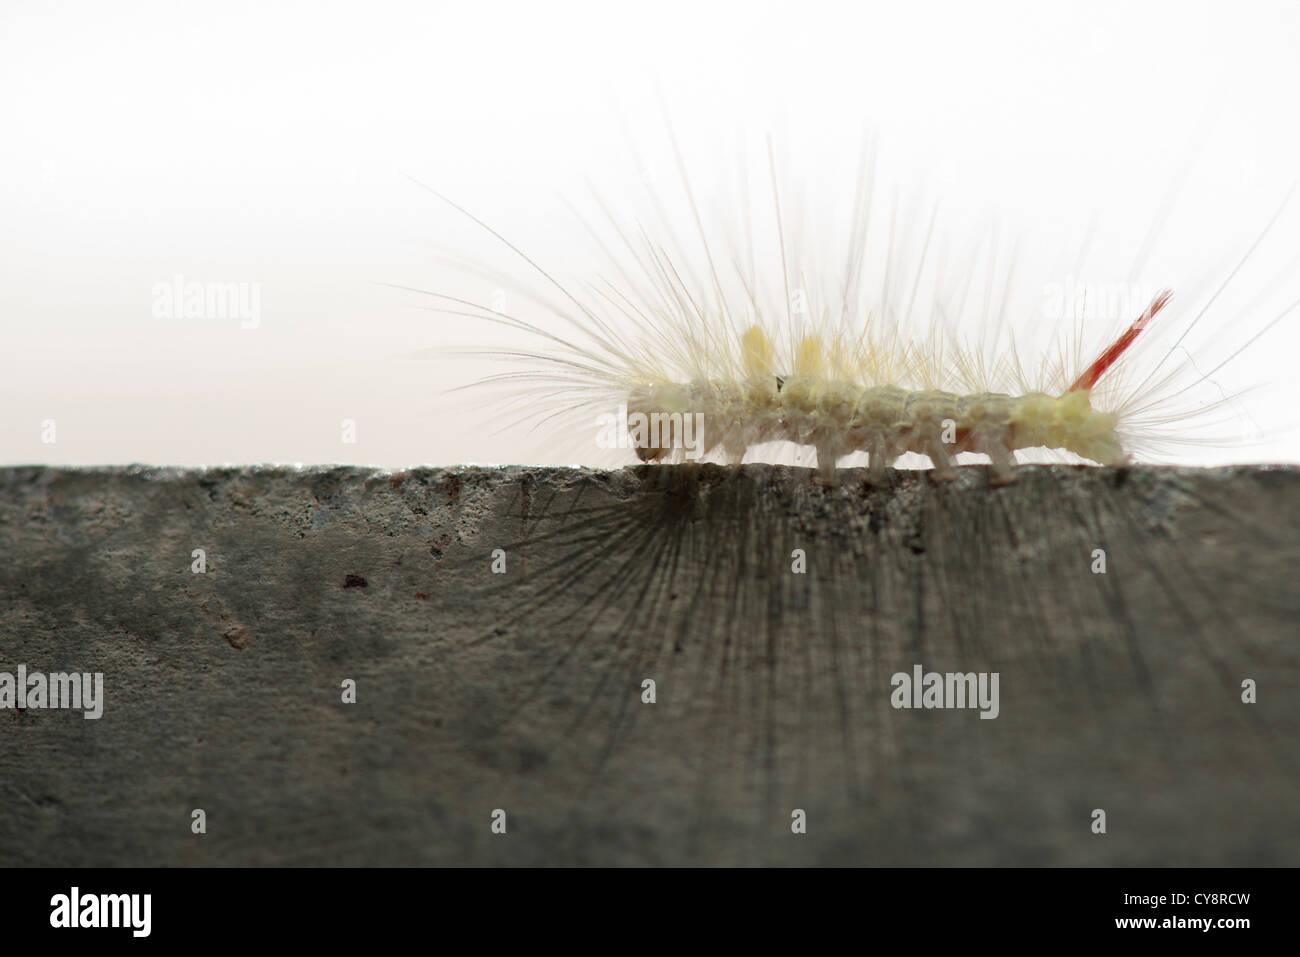 Fuzzy caterpillar - Stock Image